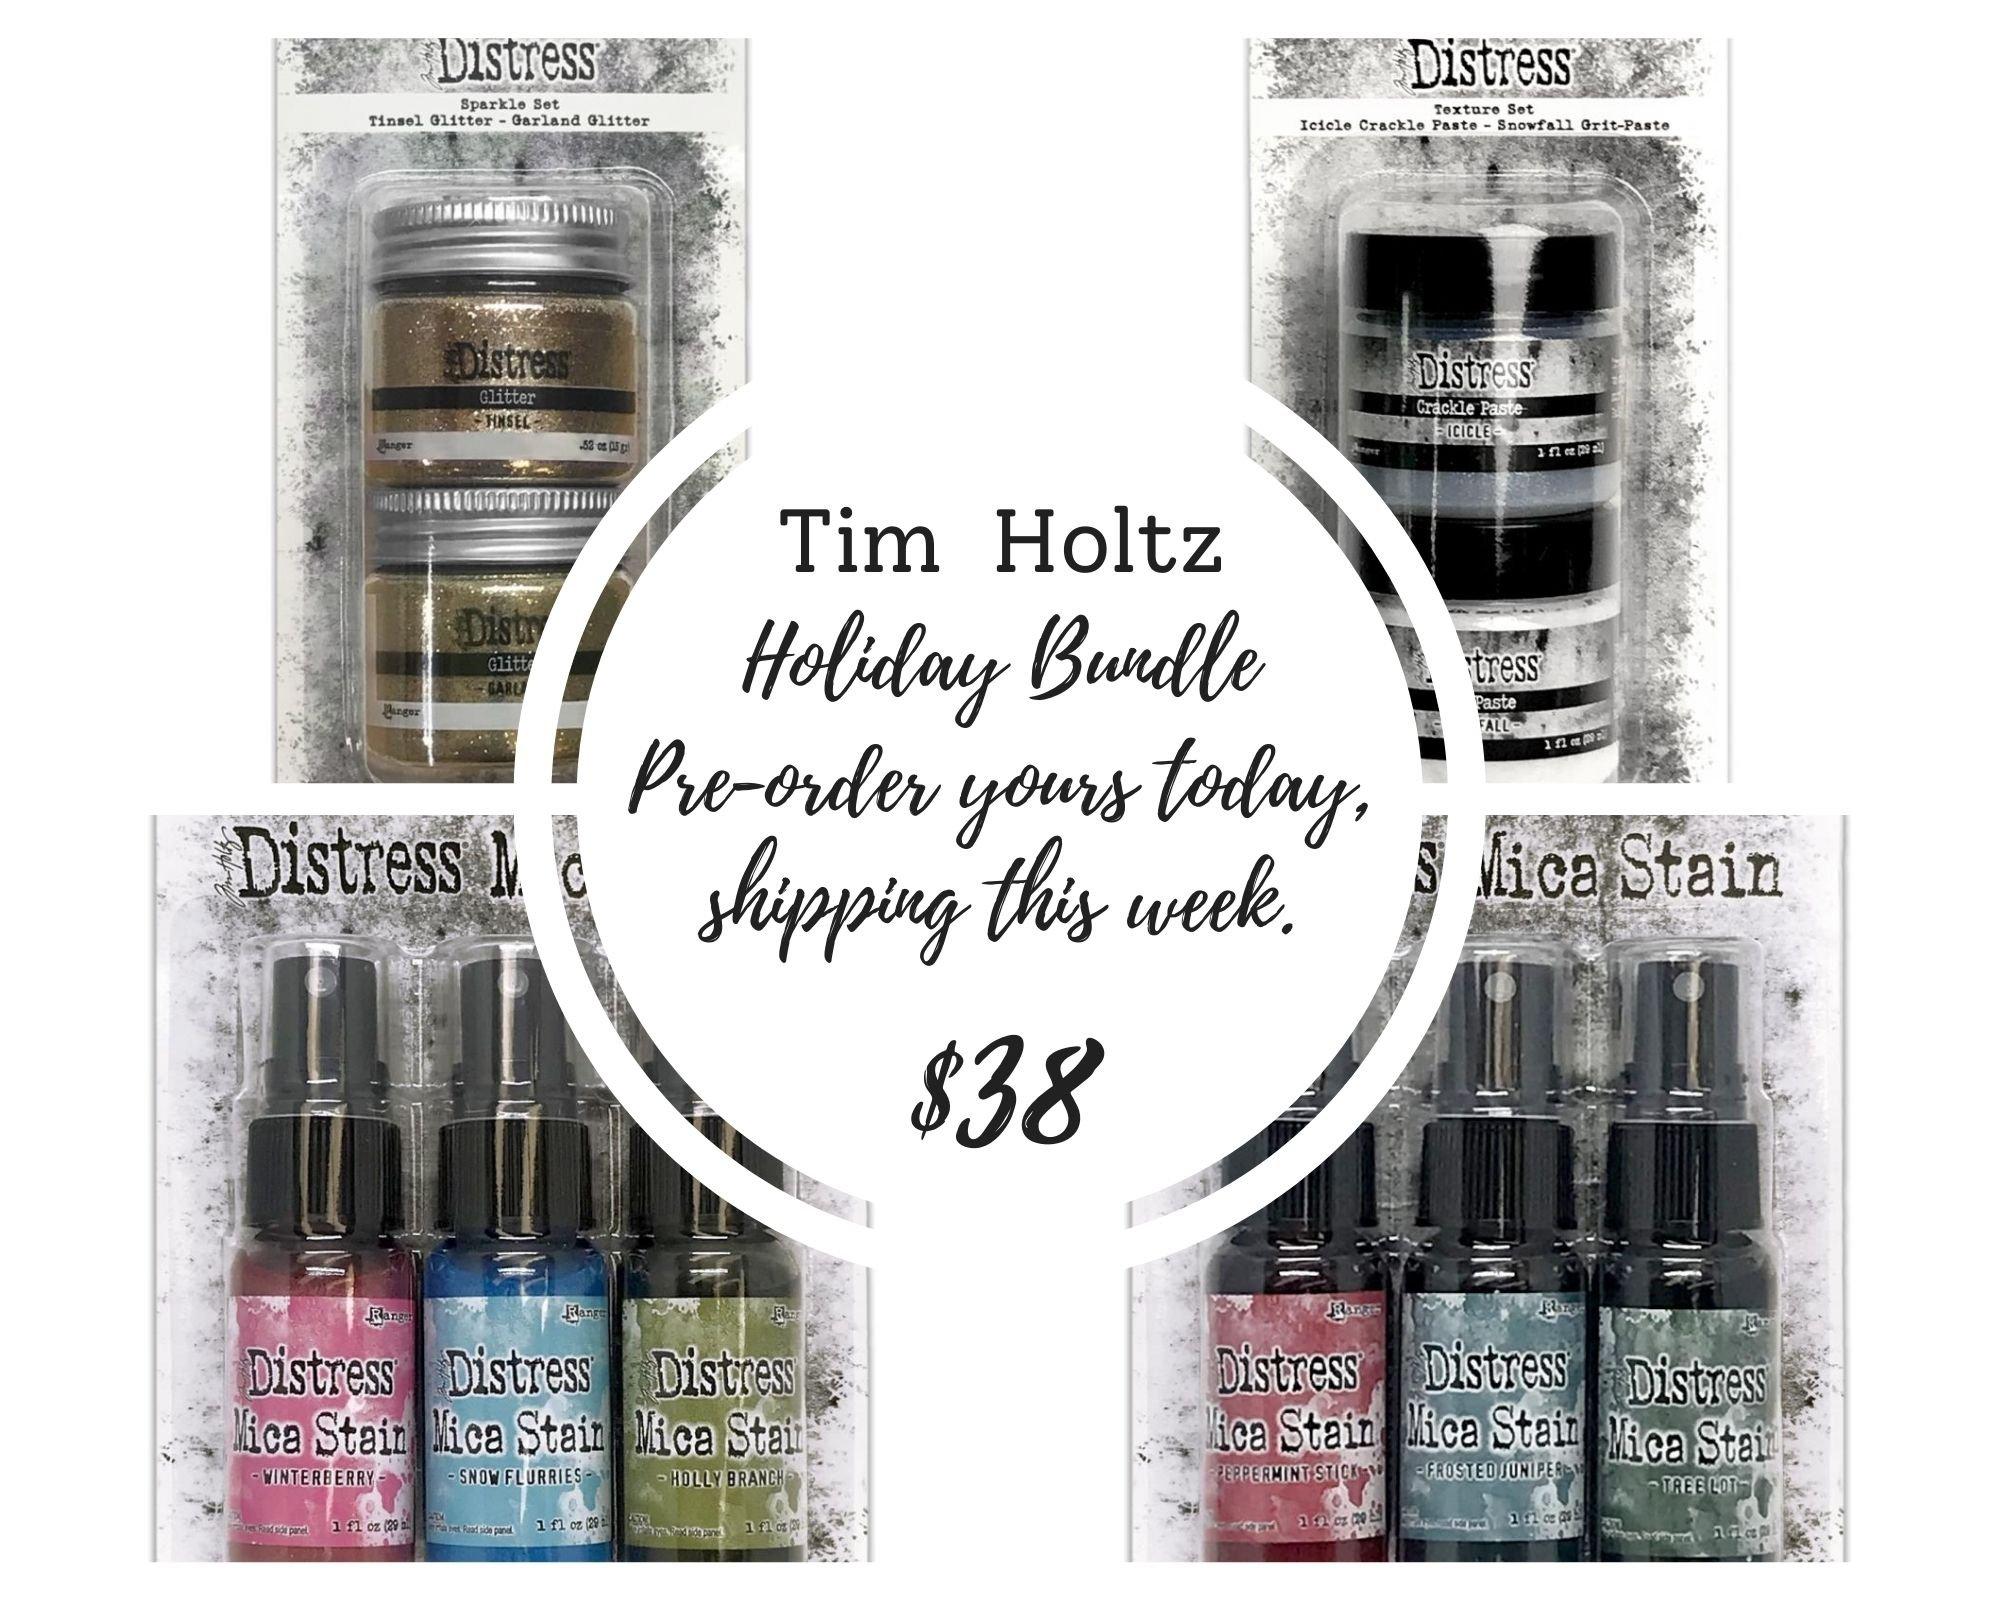 Tim Holtz Holiday Bundle